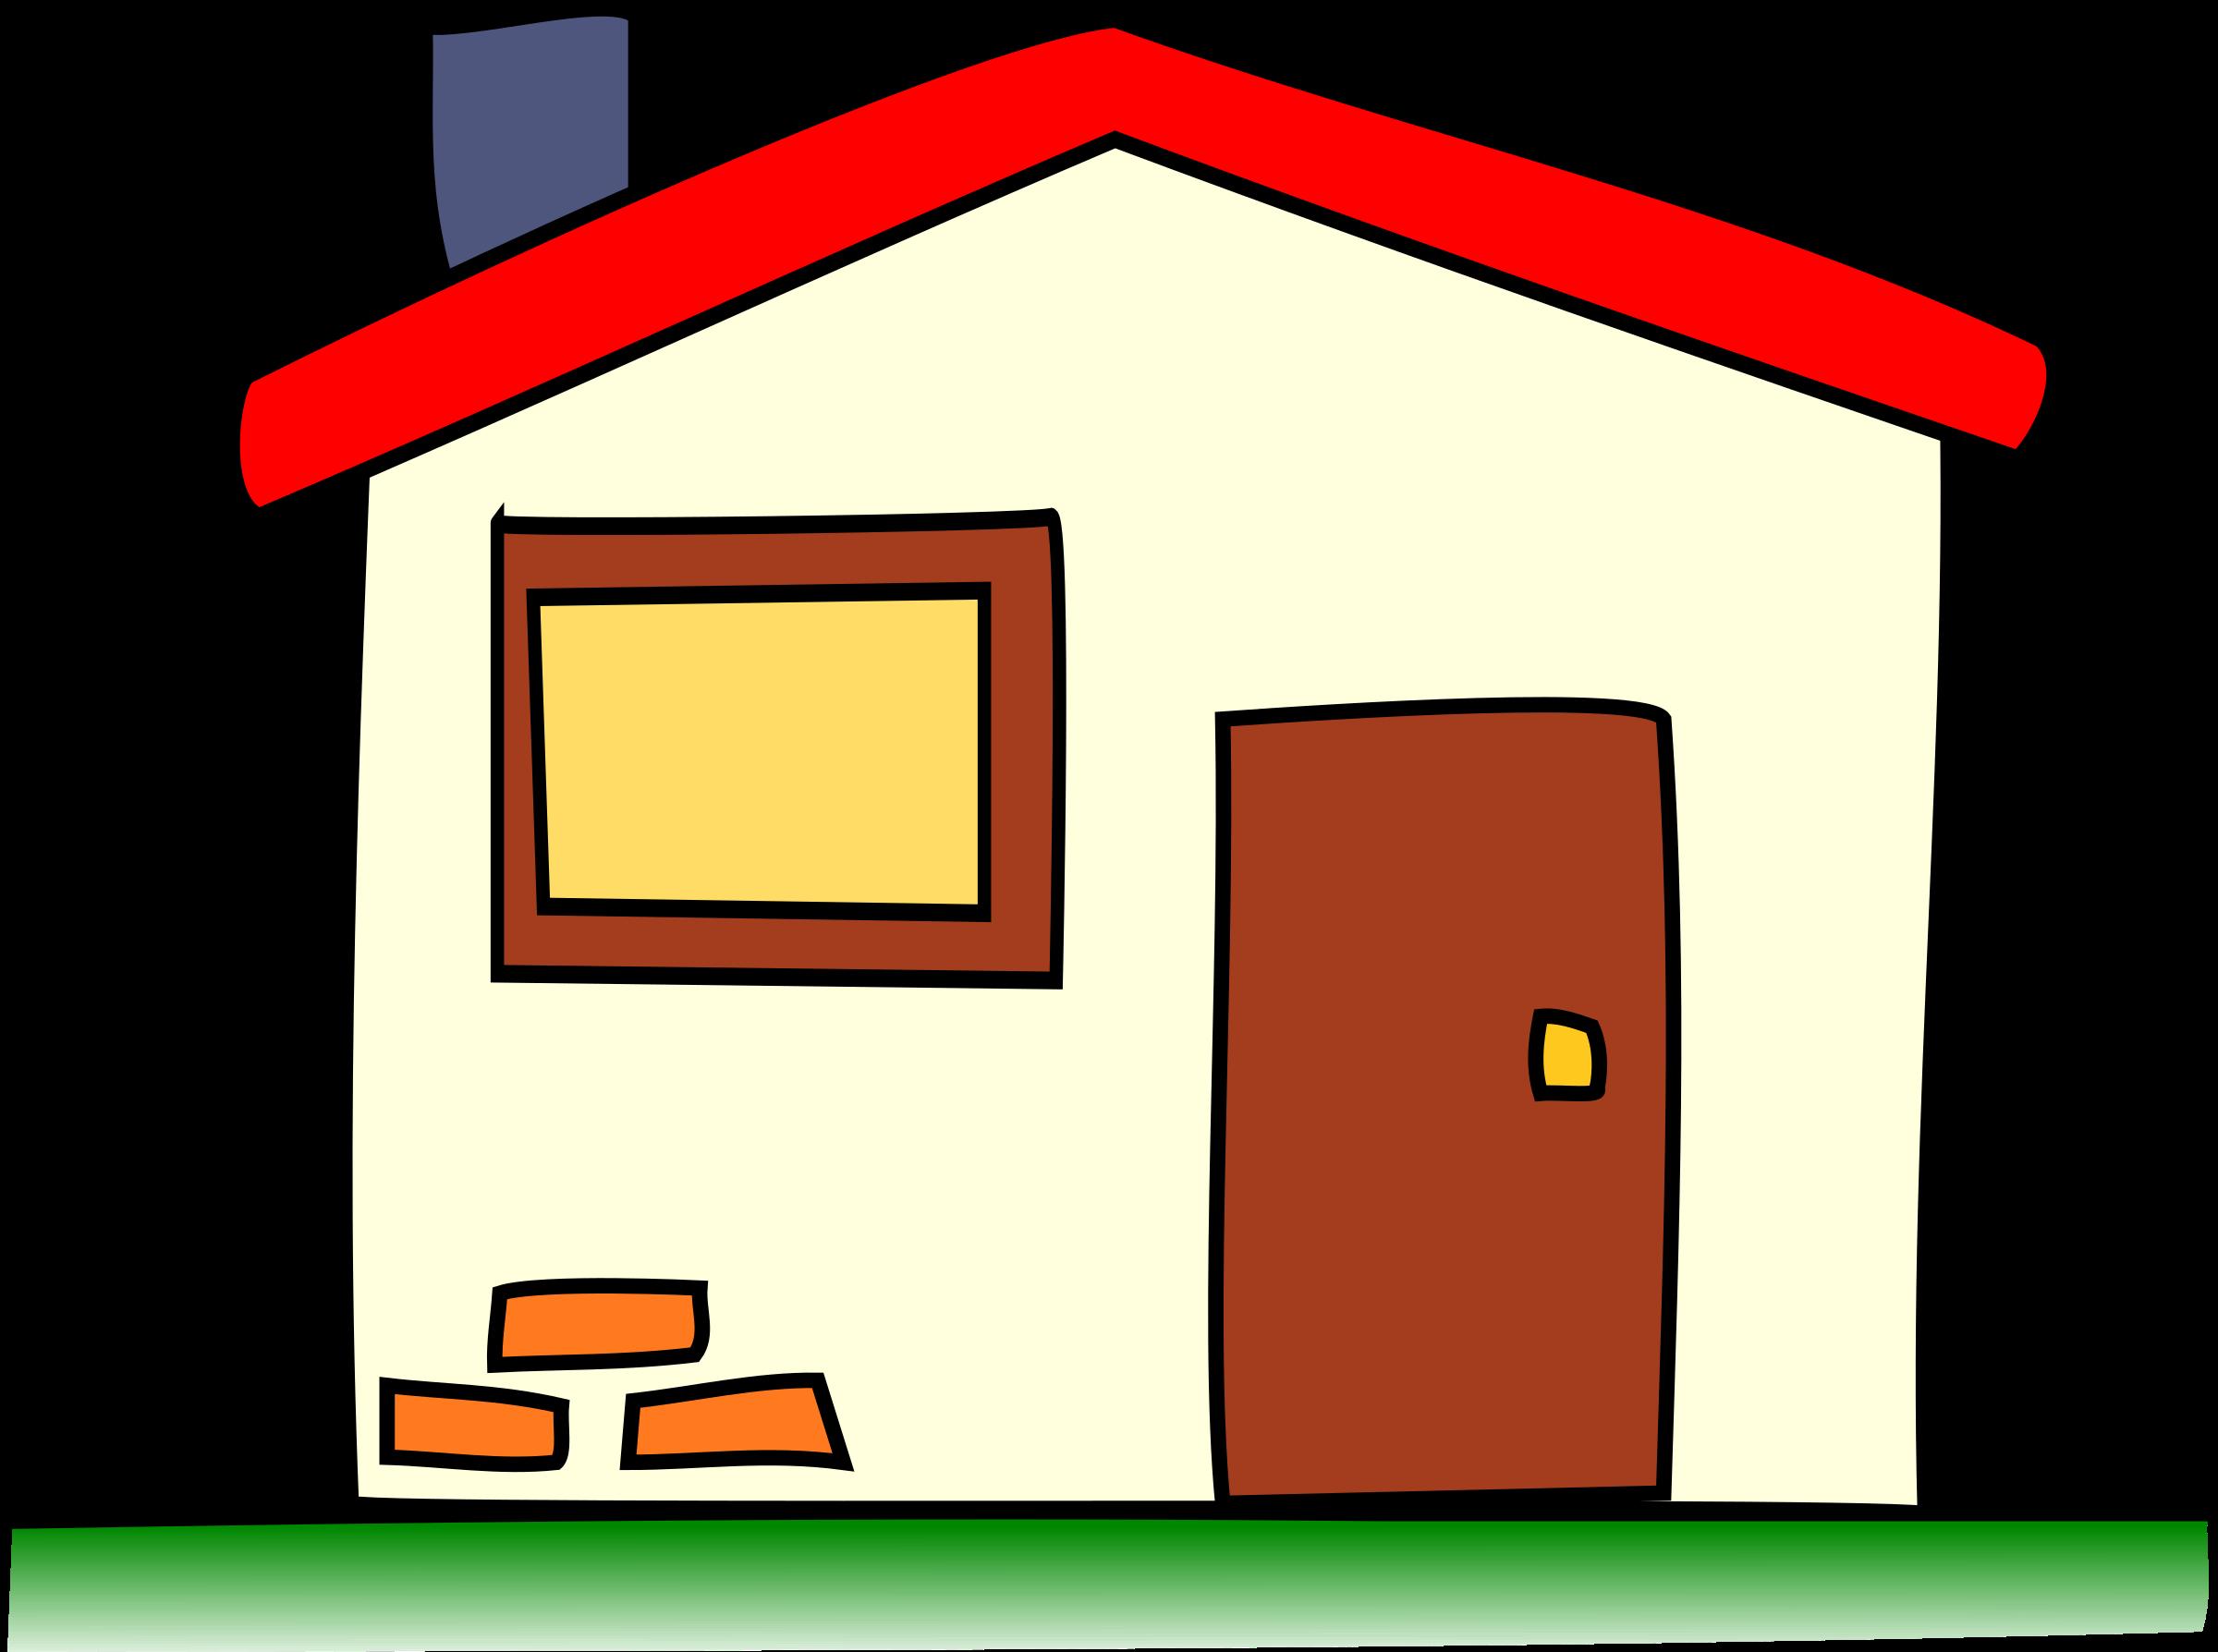 Clipart - my house-Clipart - my house-15